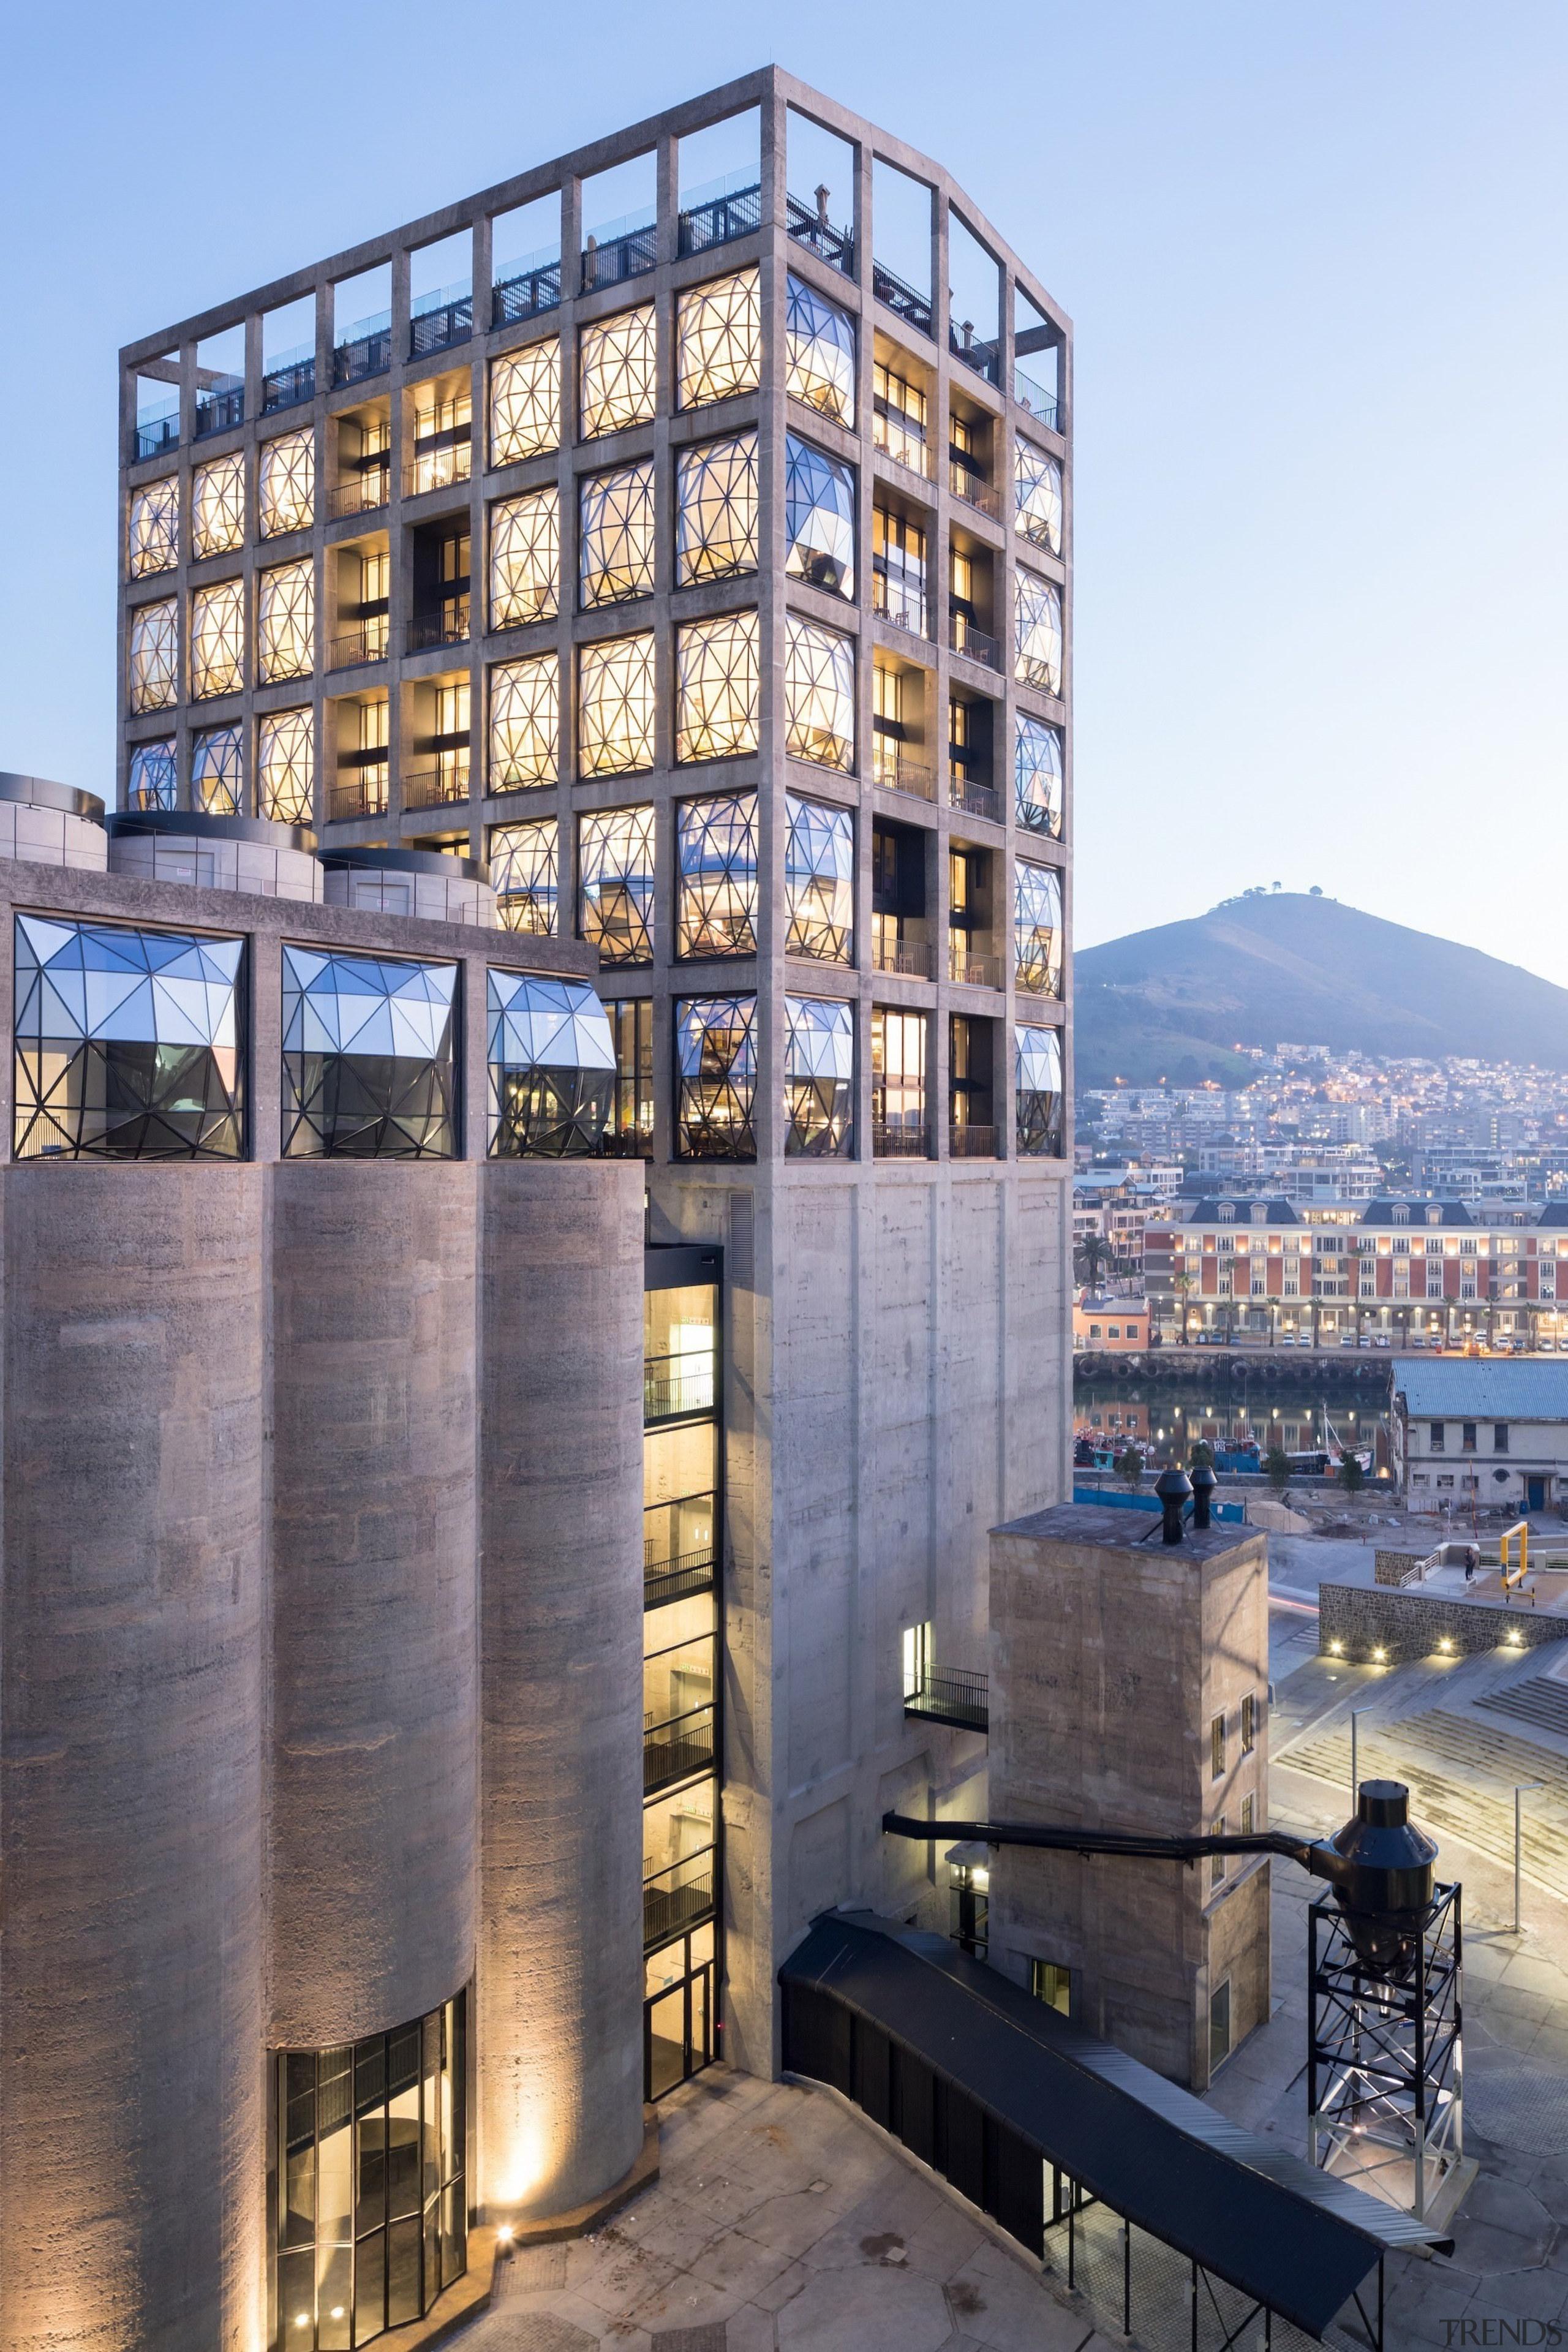 The Zeitz Museum of Contemporary Art Africa (Zeitz apartment, architecture, building, city, condominium, facade, metropolis, mixed use, real estate, sky, tower block, gray, teal